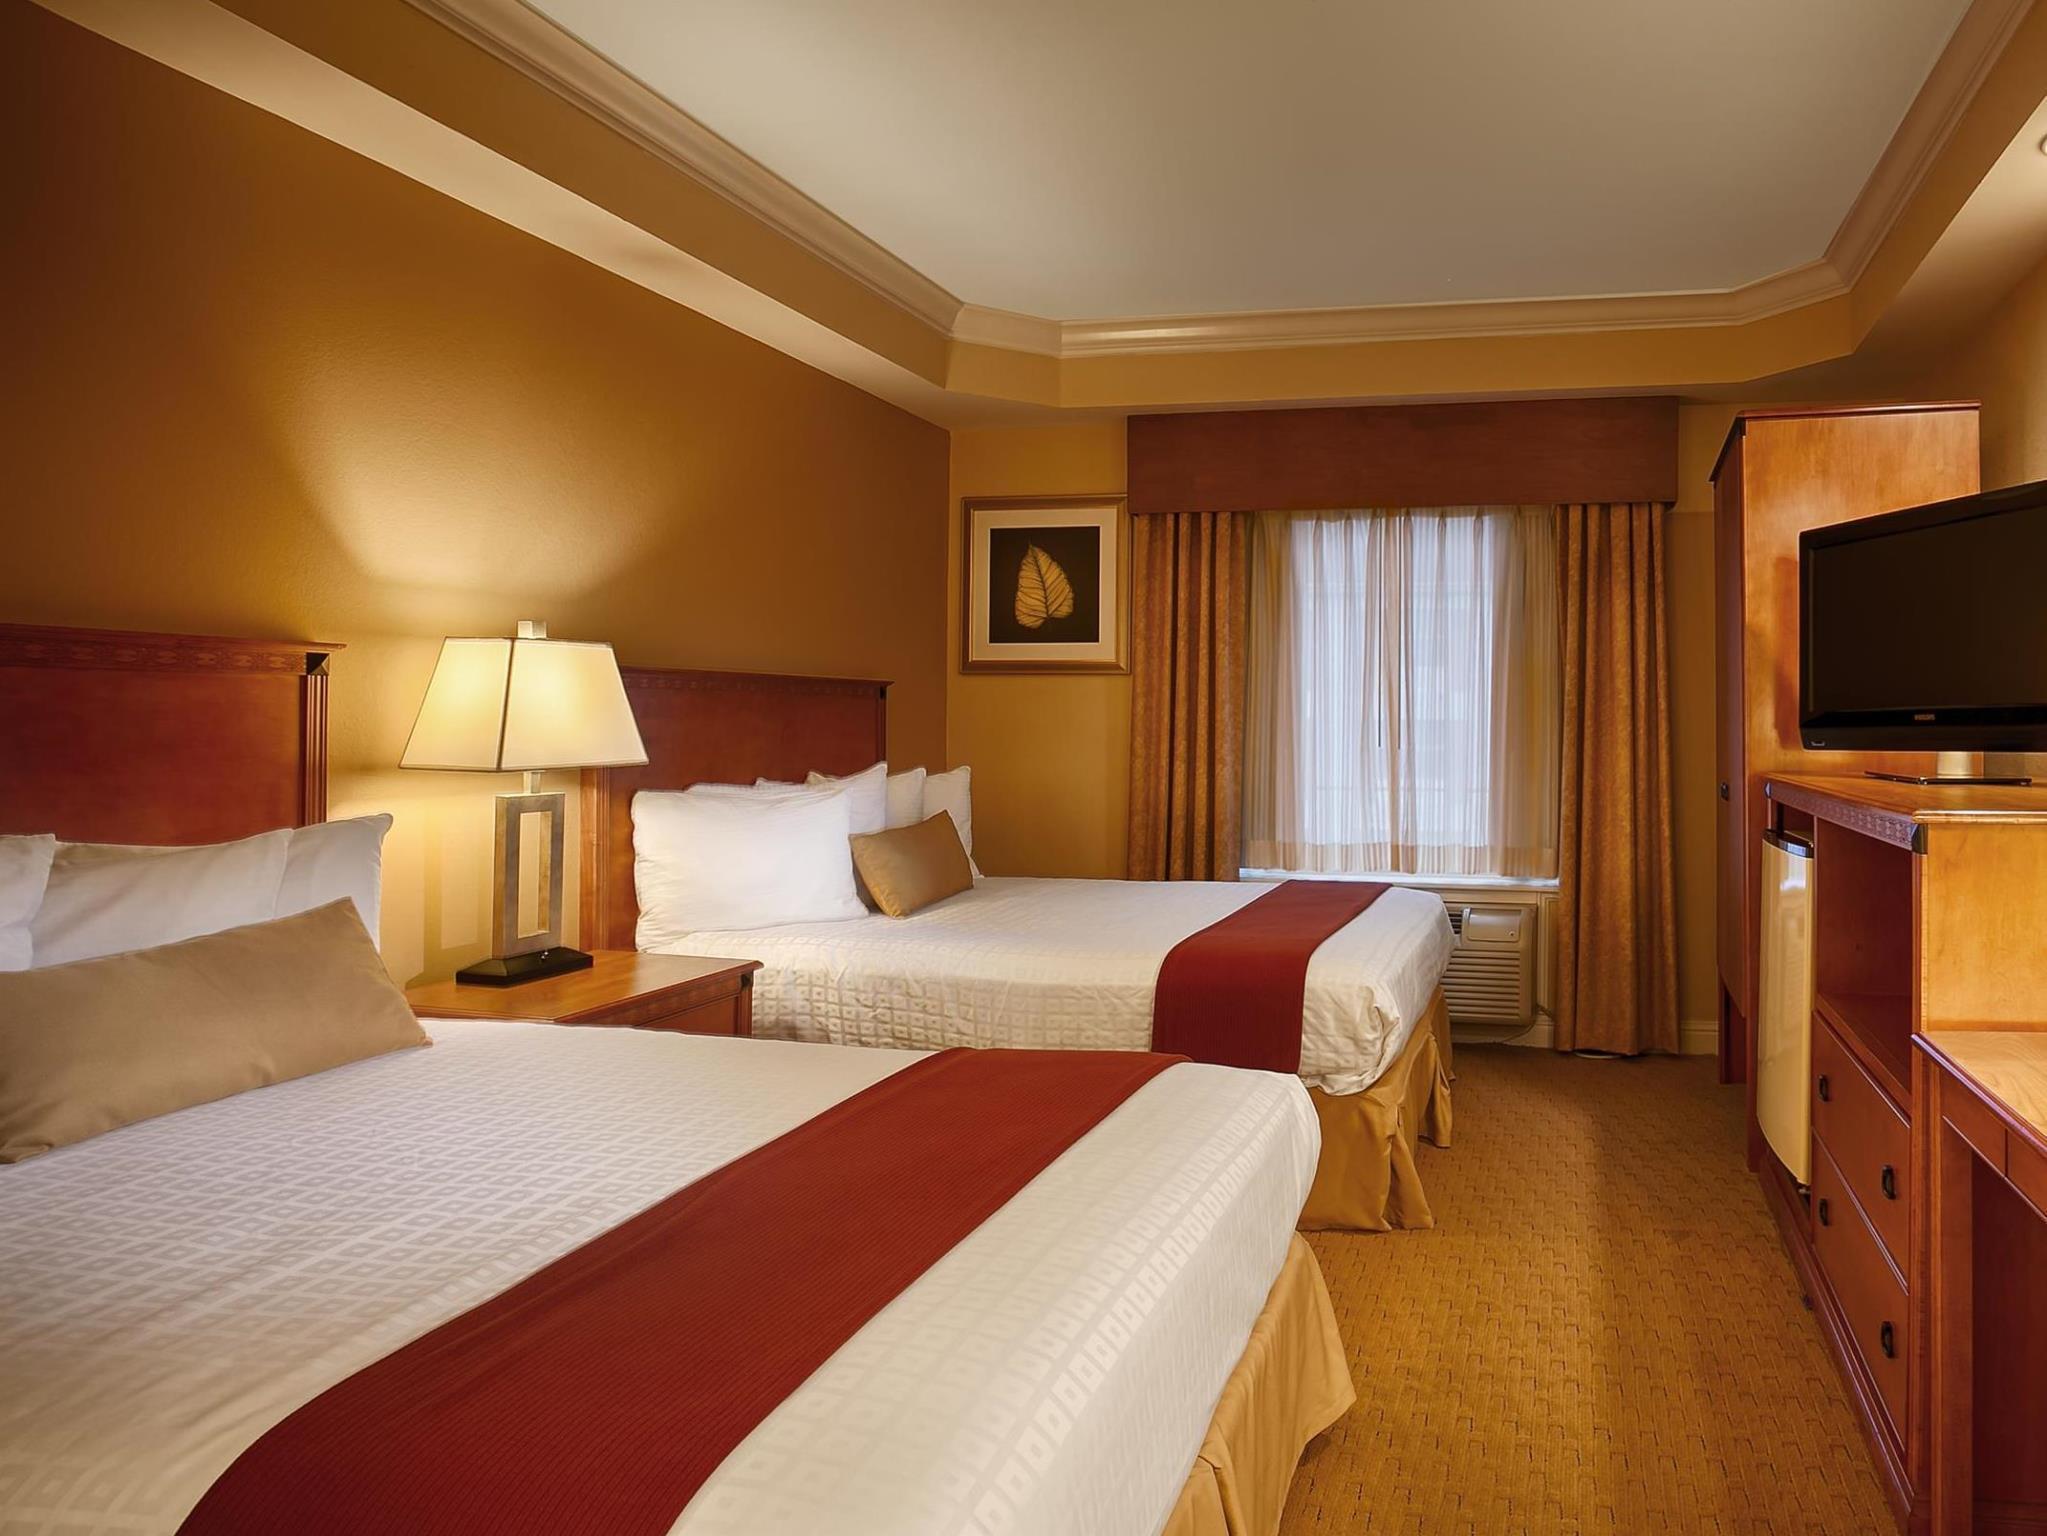 Best Western Plus Kingsland Kingsland Ga Room Rates